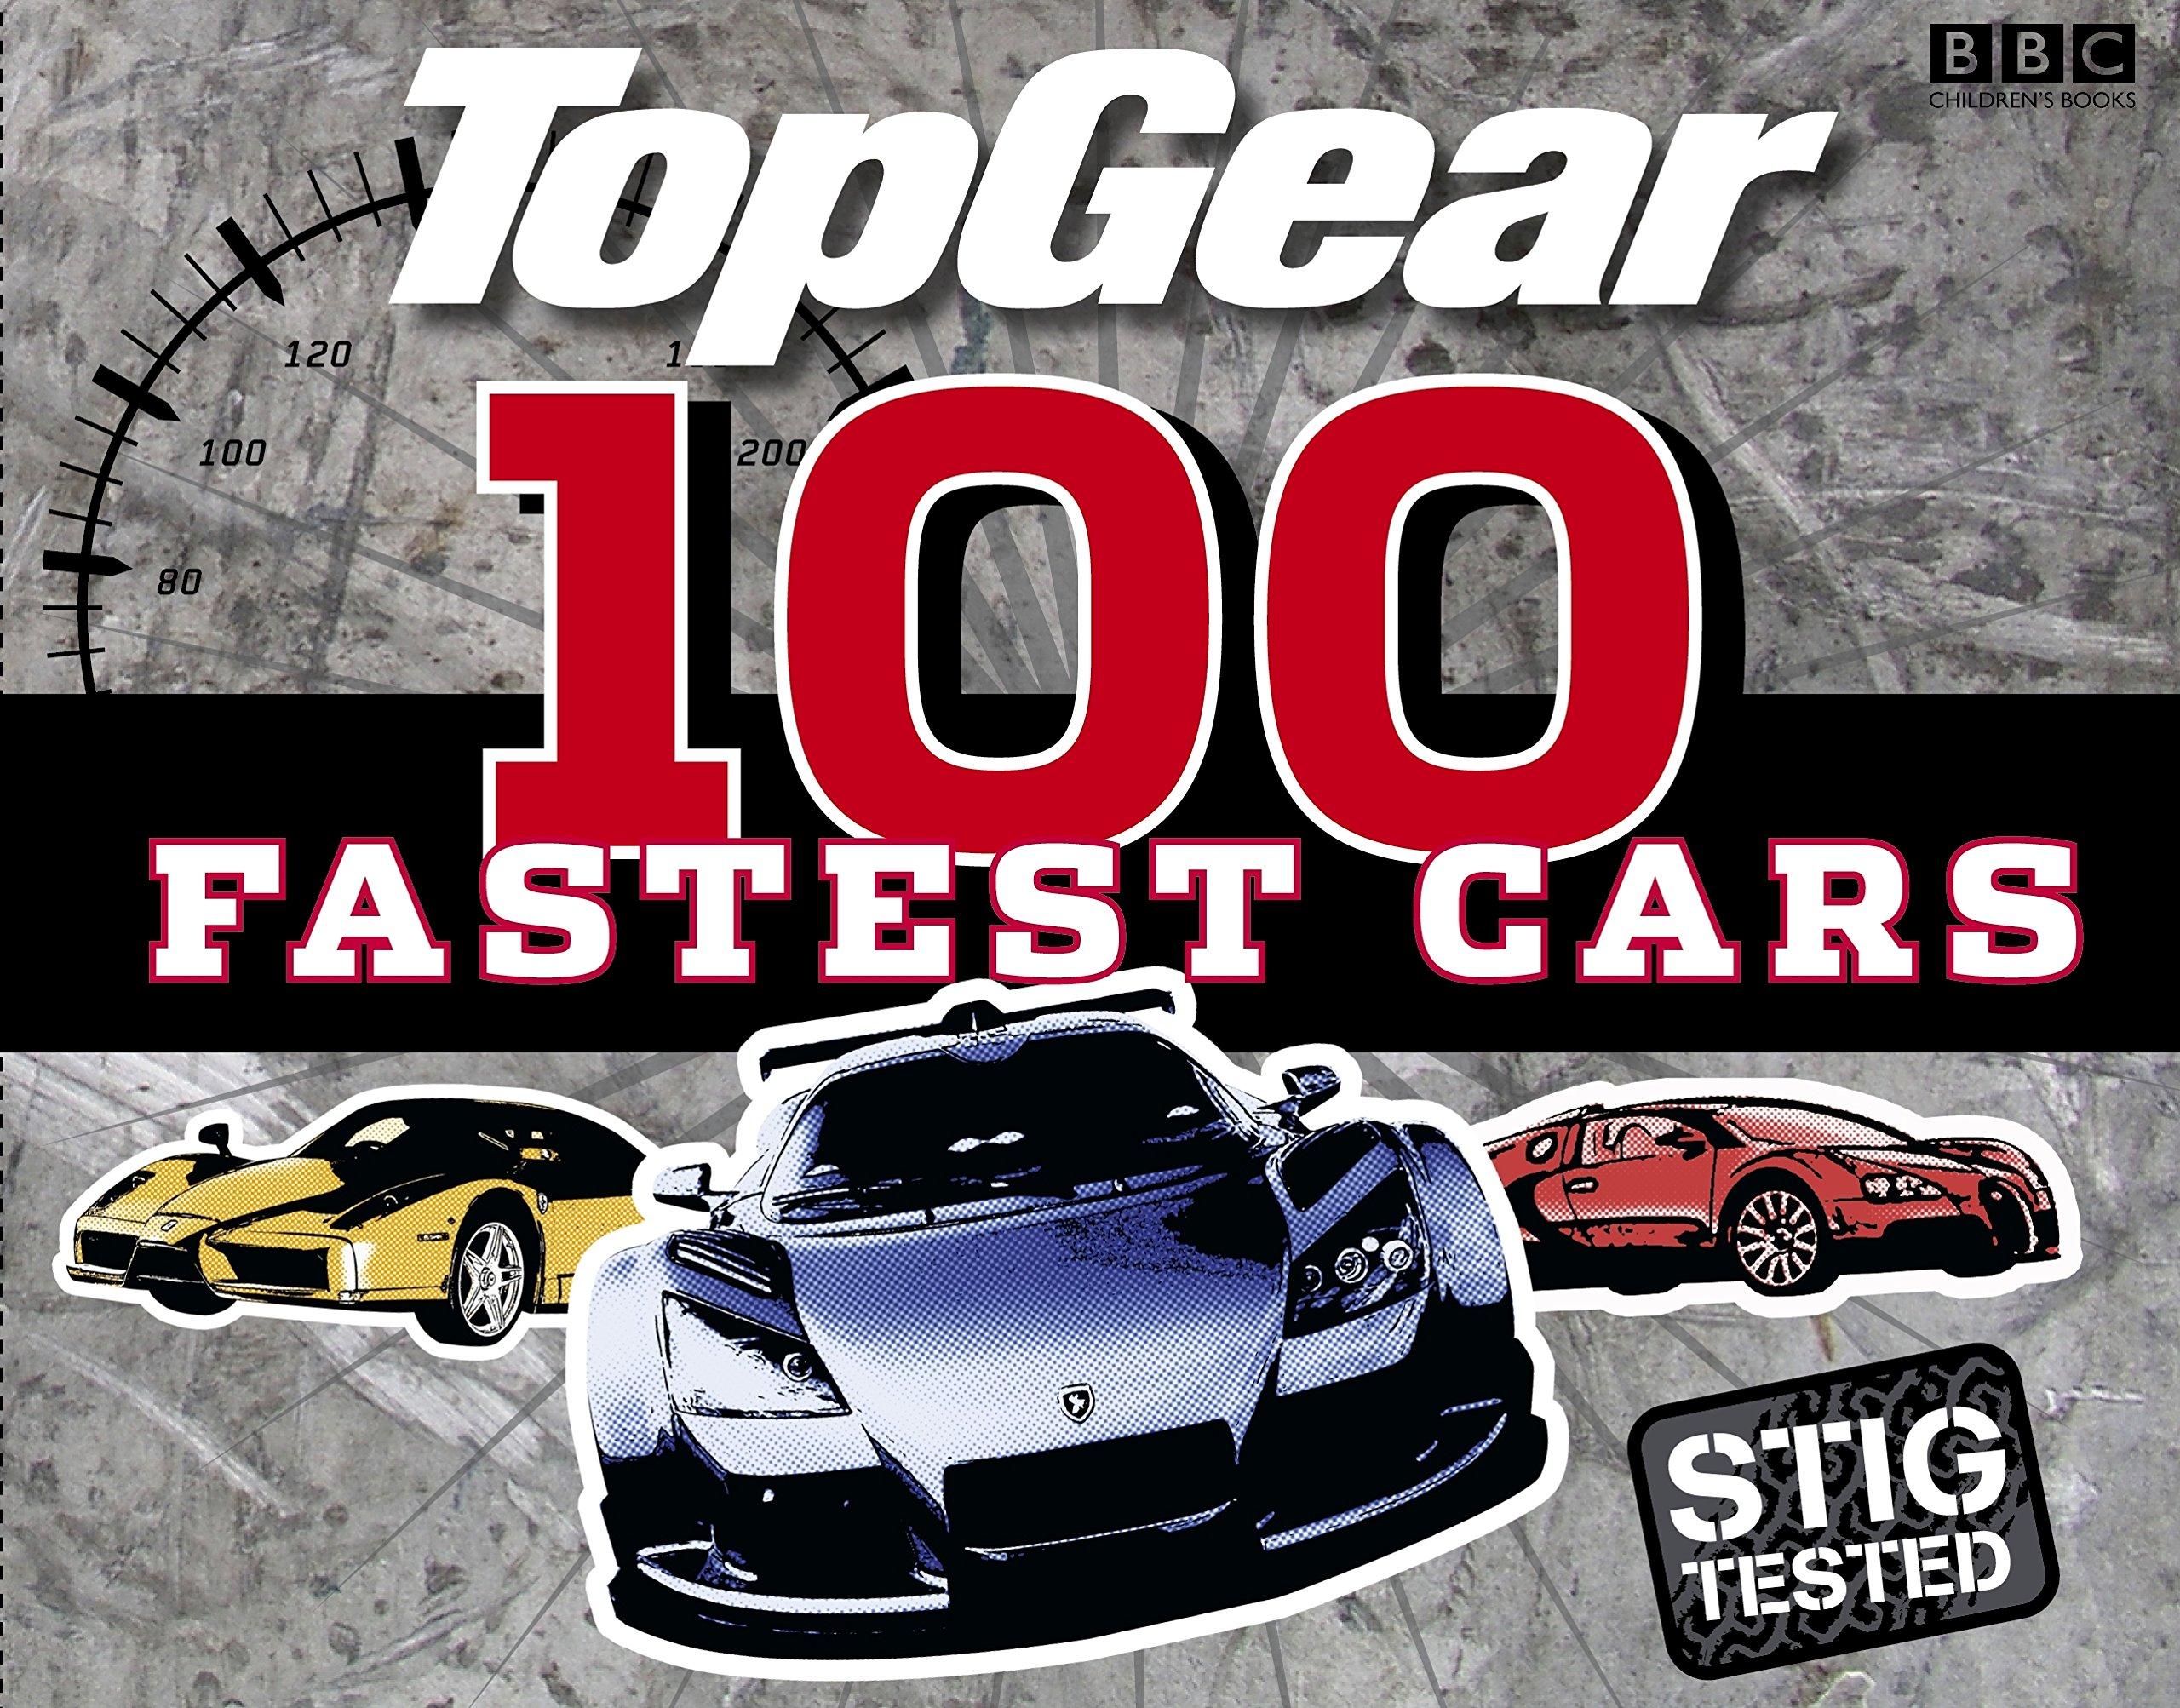 Top Gear: 100 Fastest Cars: Amazon.es: Books, BBC Children: Libros en idiomas extranjeros